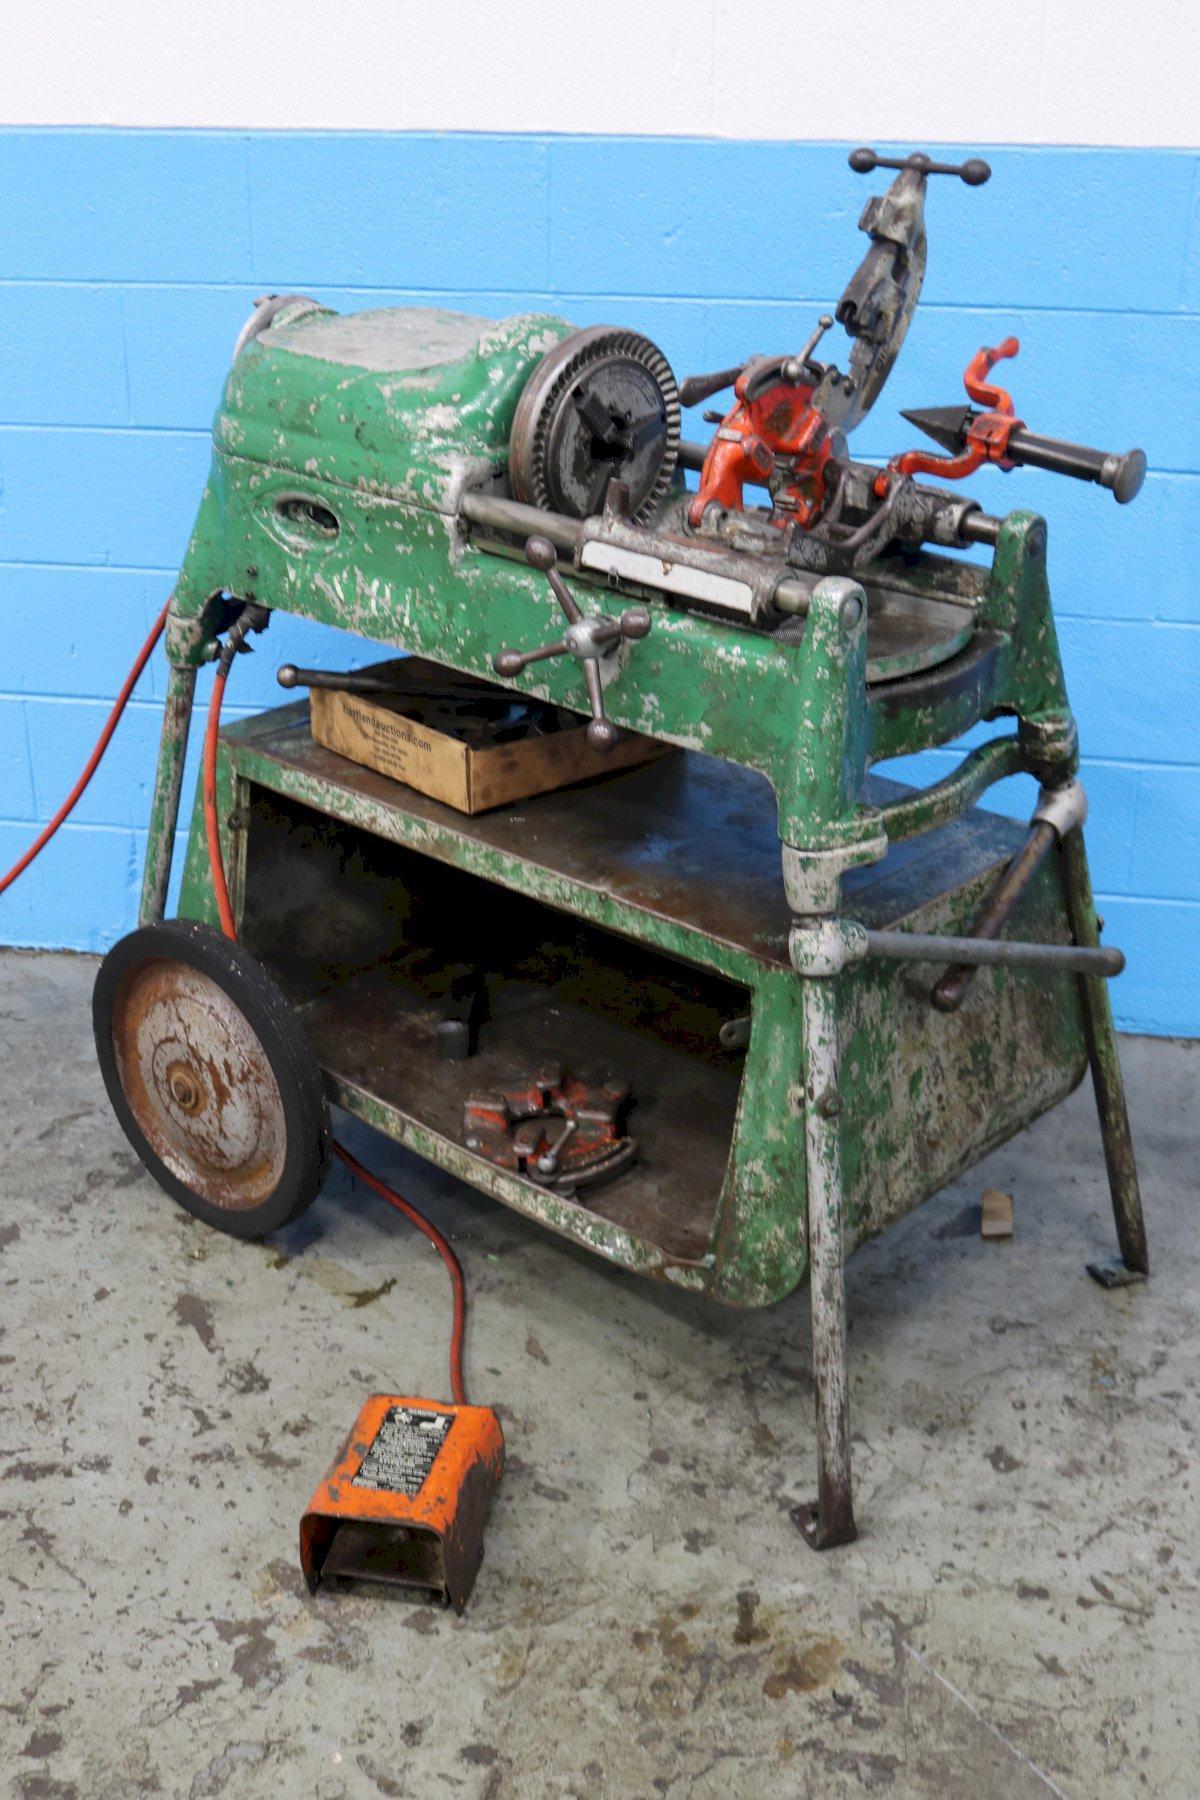 RIDGID MODEL #535 PORTABLE THREADING MACHINE: STOCK #73512